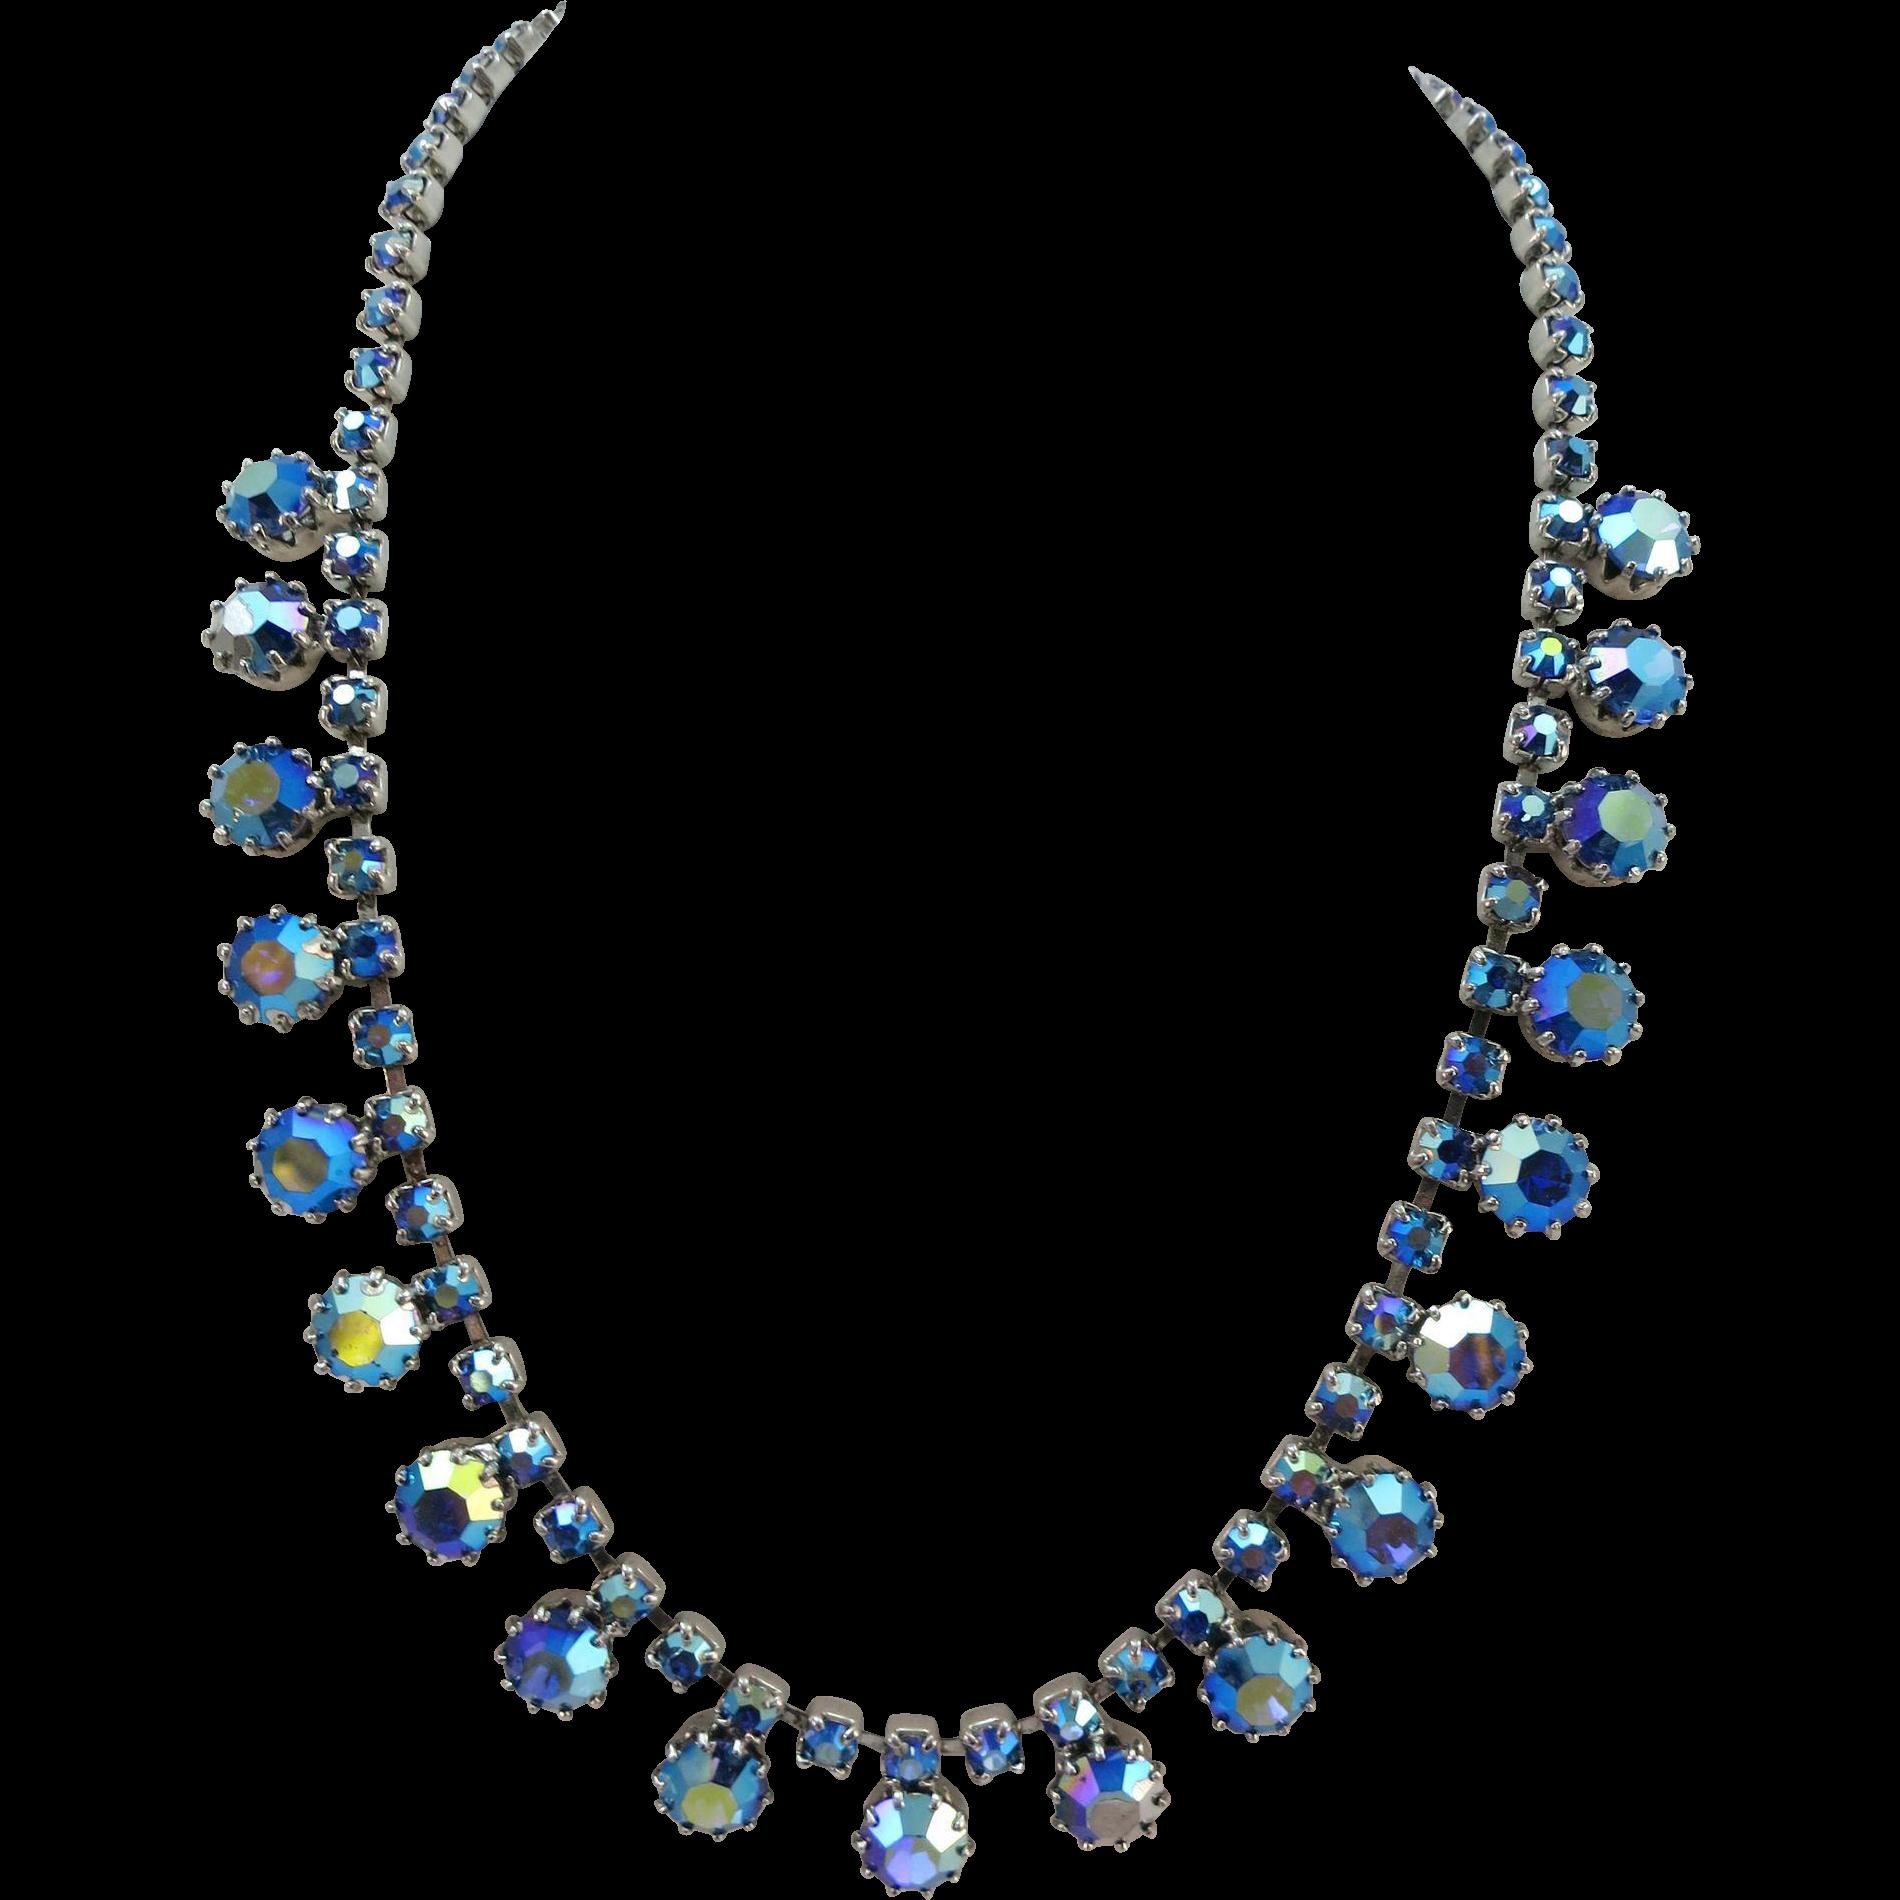 VINTAGE 60'S Rhinestone Necklace Blue Blue Blue